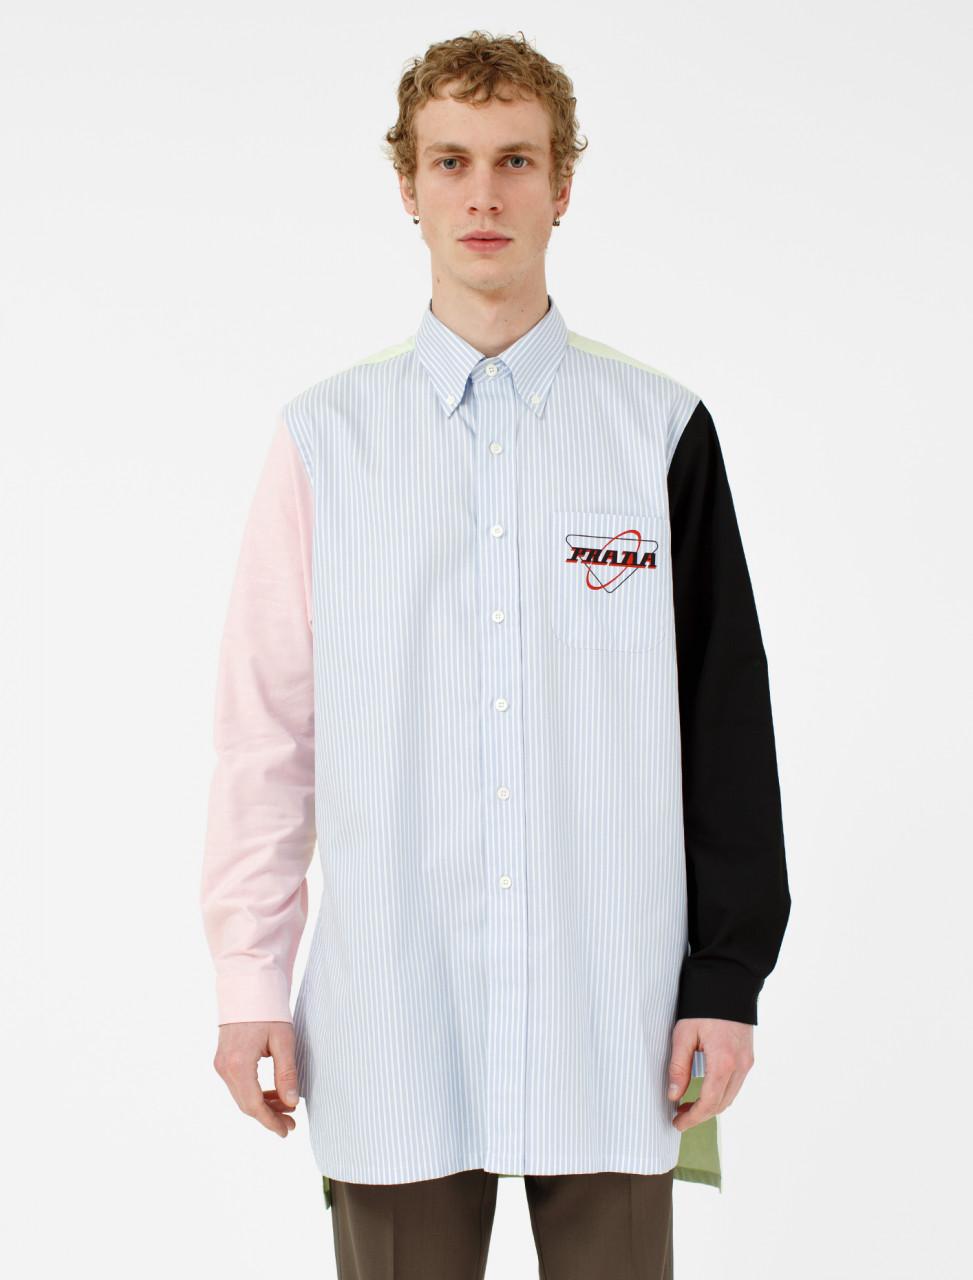 Prada Oxford Shirt